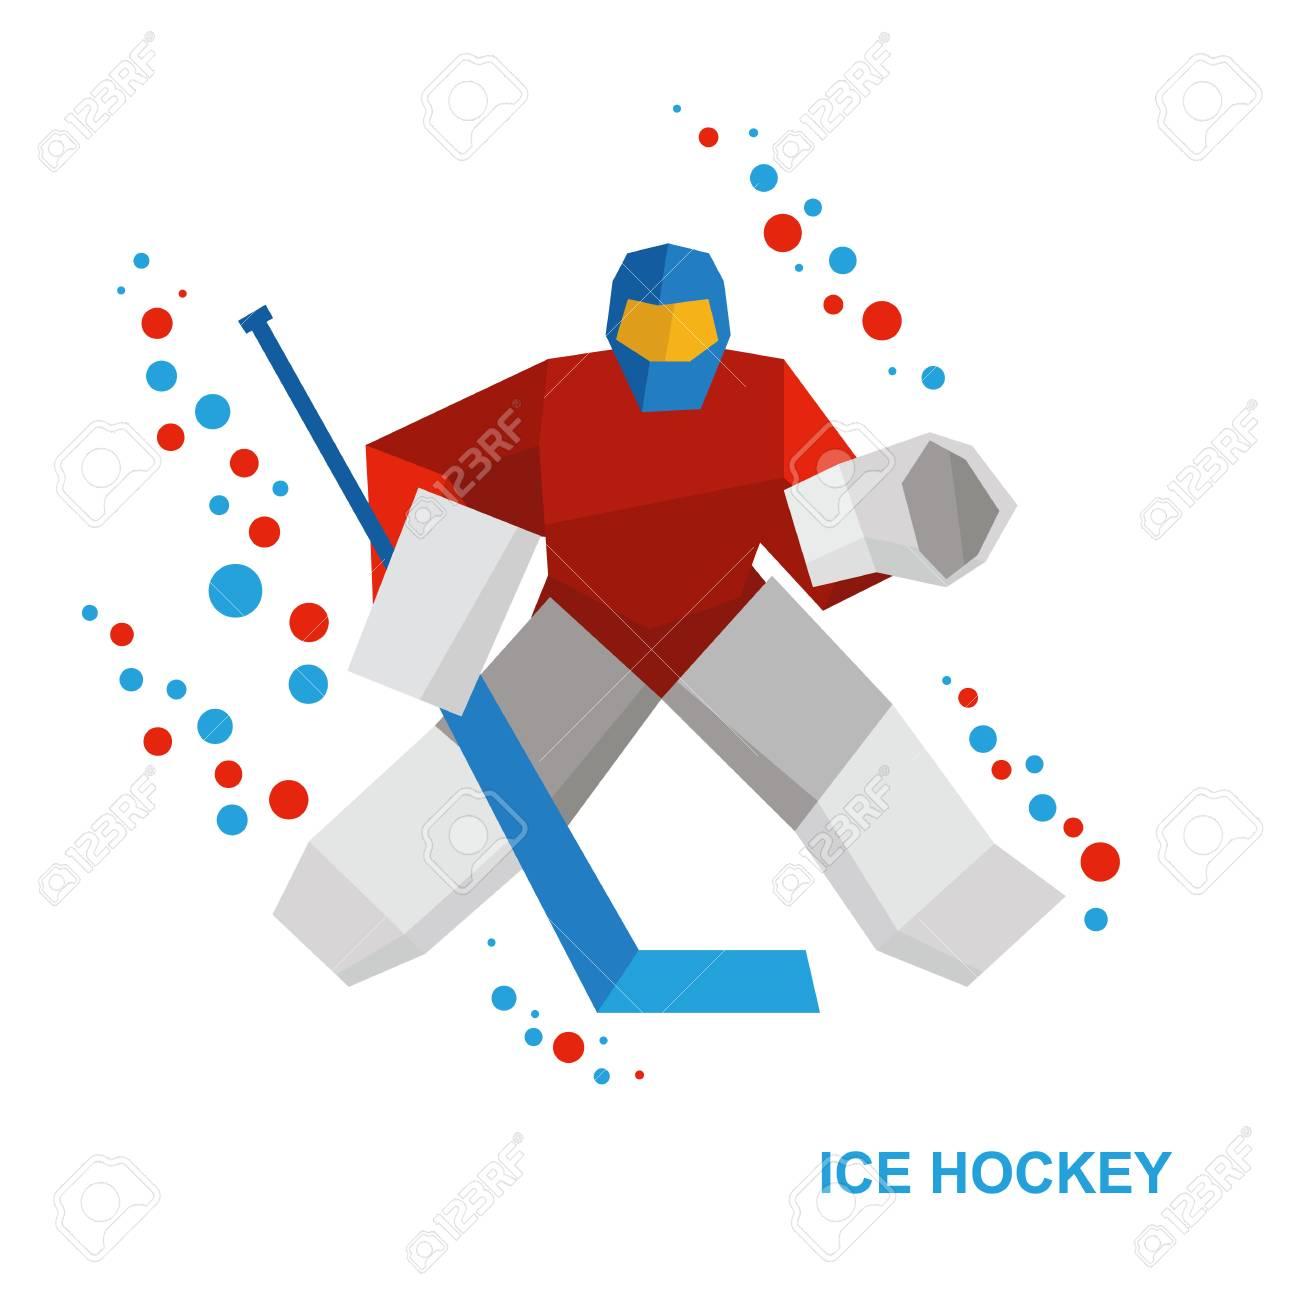 Winter Sports Ice Hockey Cartoon Goalkeeper With Hockey Stick